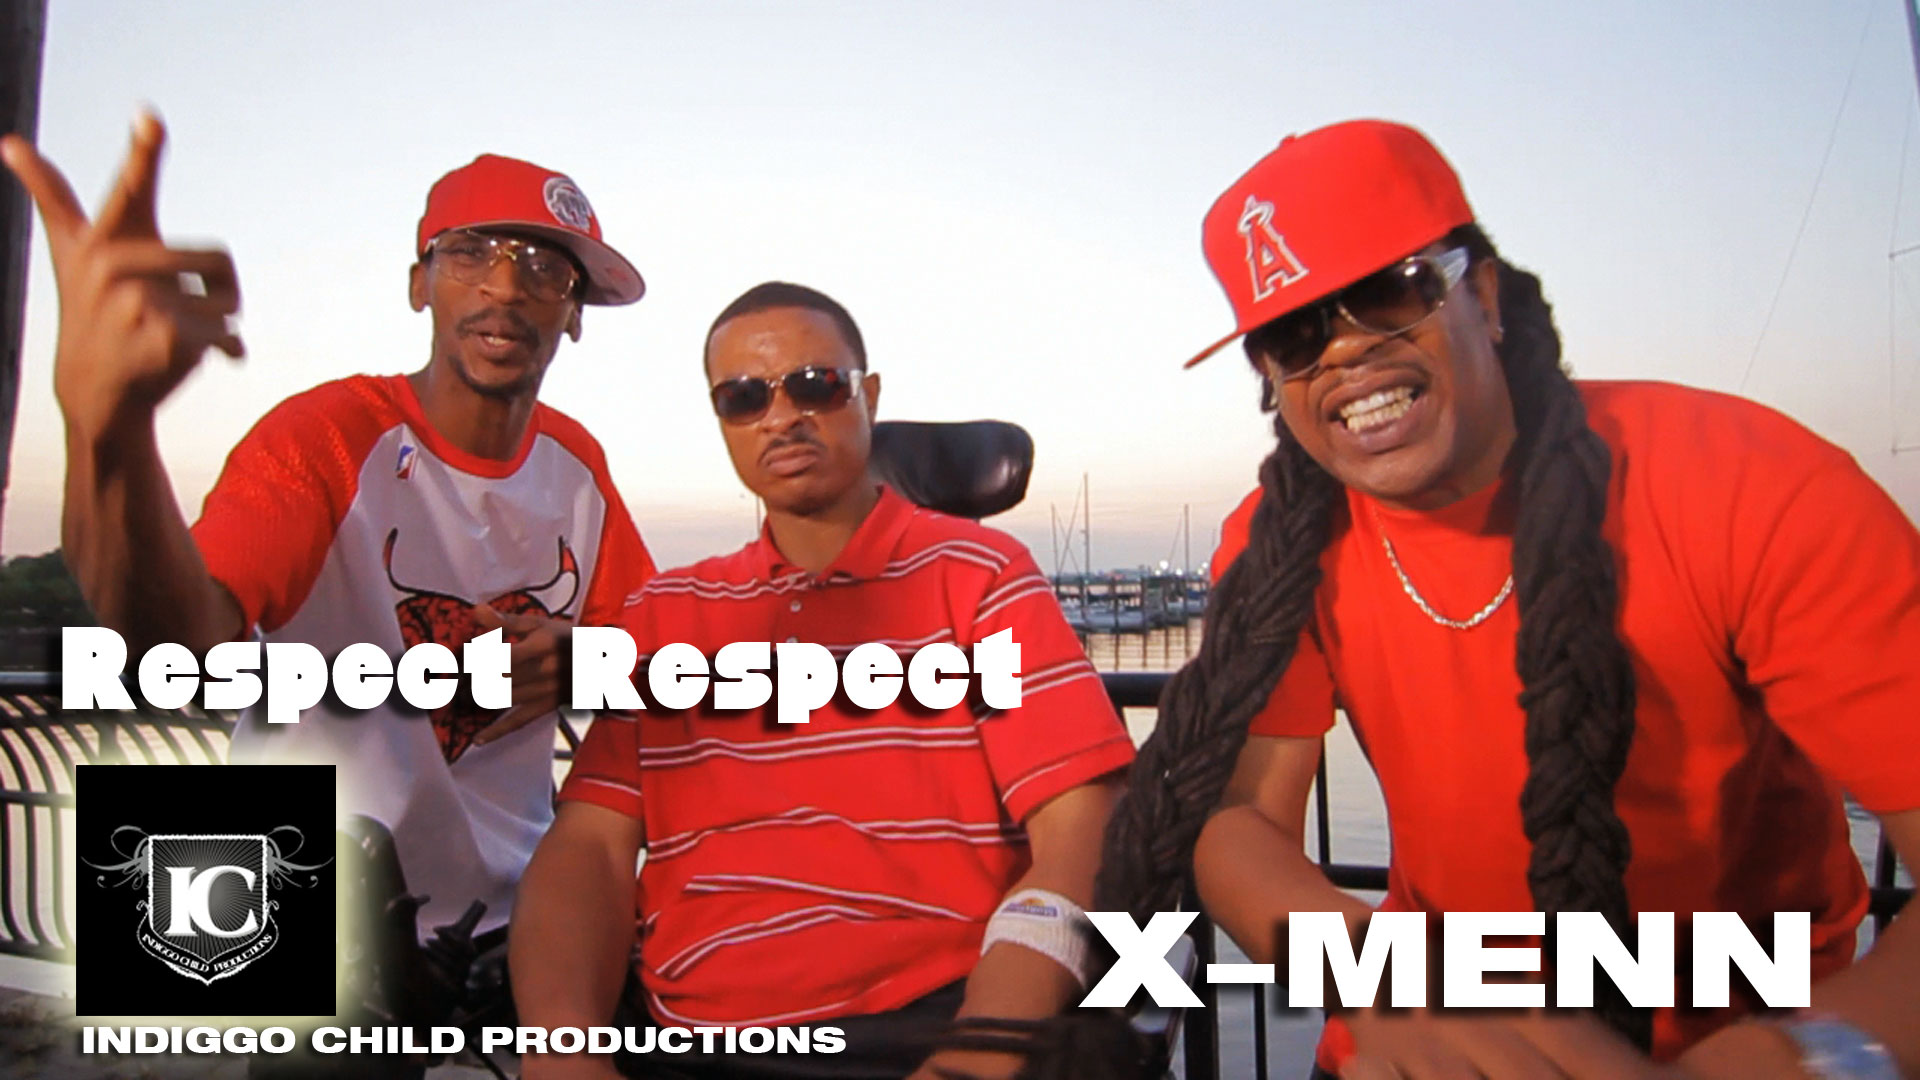 Respect Respect CD Cover